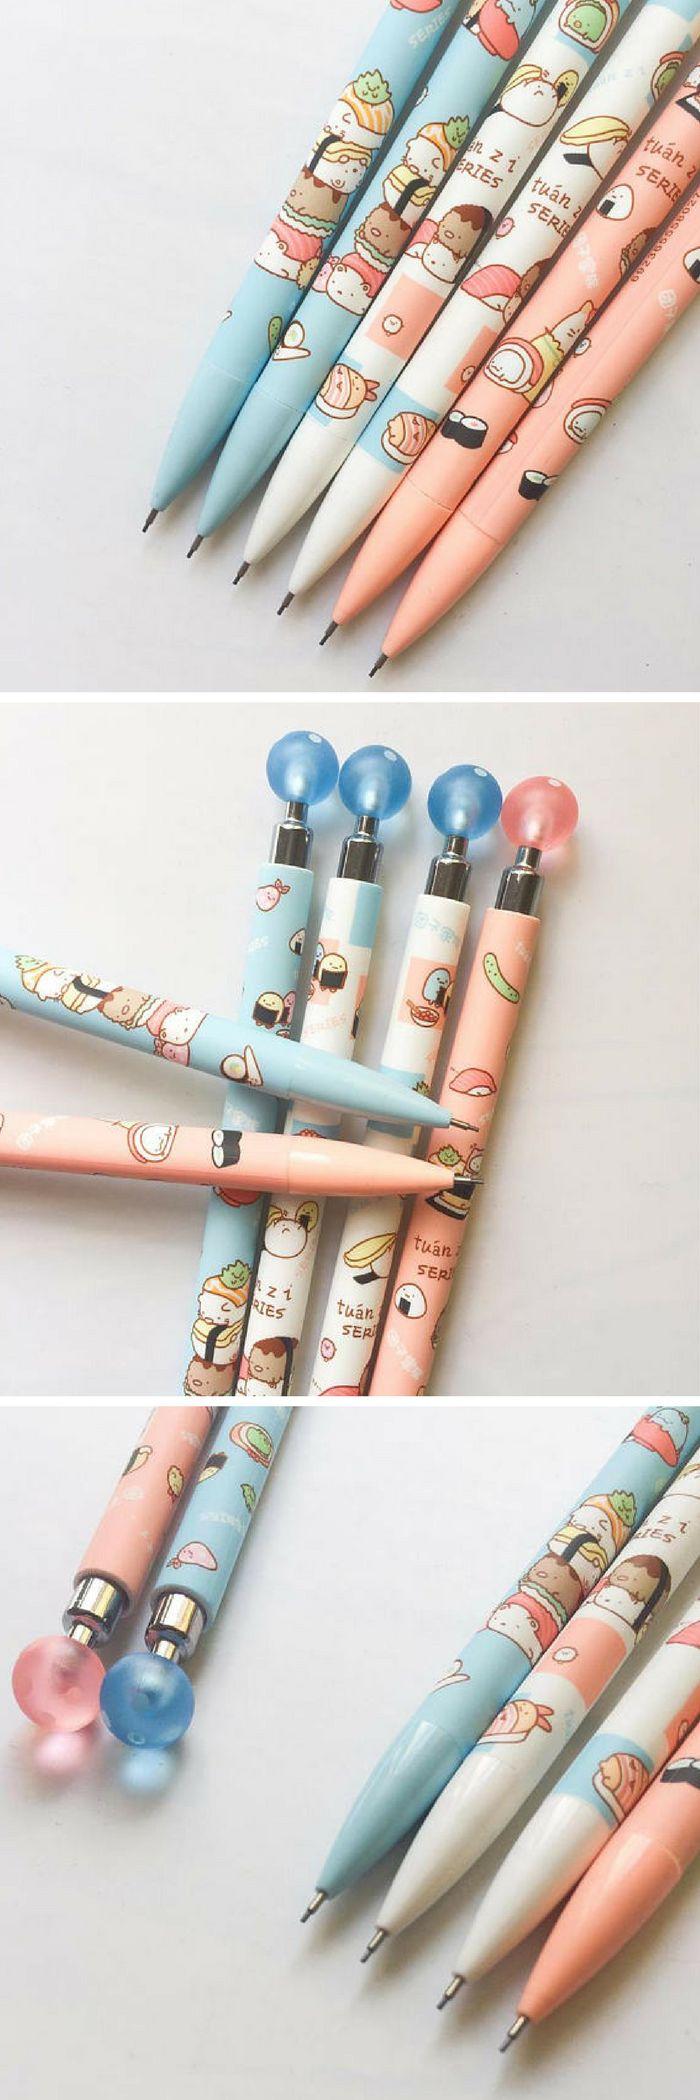 Sumikko Gurashi Sushi Mechanical Pencils - Cute Kawaii School Supplies! I LOVE kawaii Japanese stationery like these and I will be needing all these pens immediately please :D  #ad #pencils #pens #stationery #kawaii